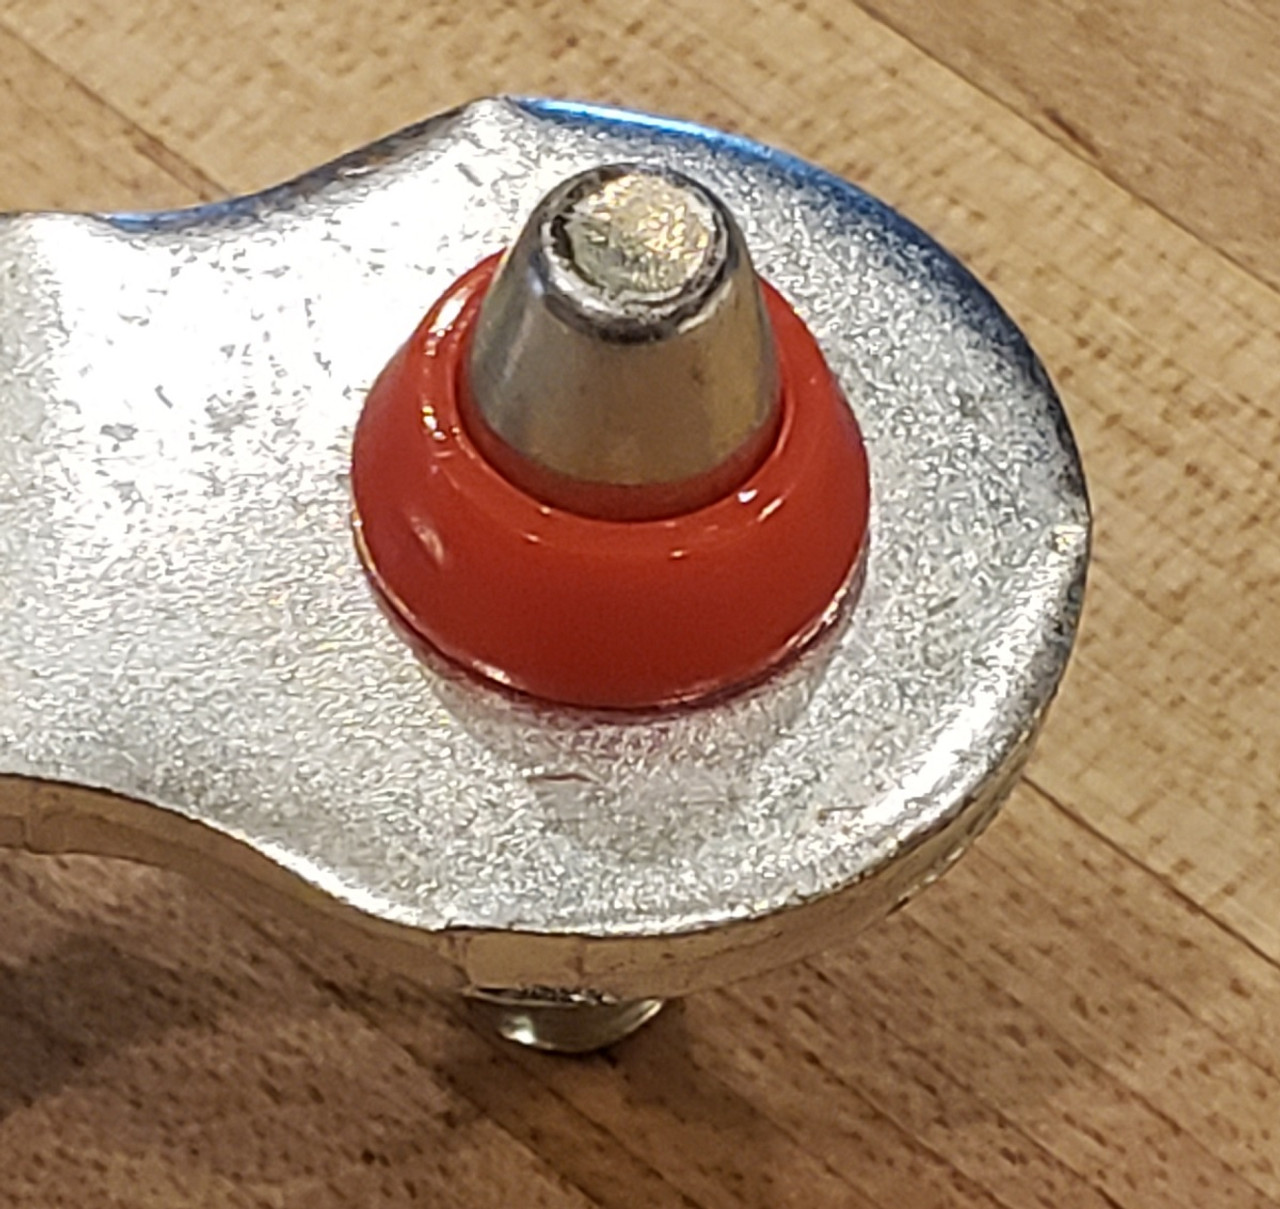 Ford Gran Torino FA1KIT™ Transmission Shift Lever / Linkage Replacement Bushing Kit fits onto pin as shown.